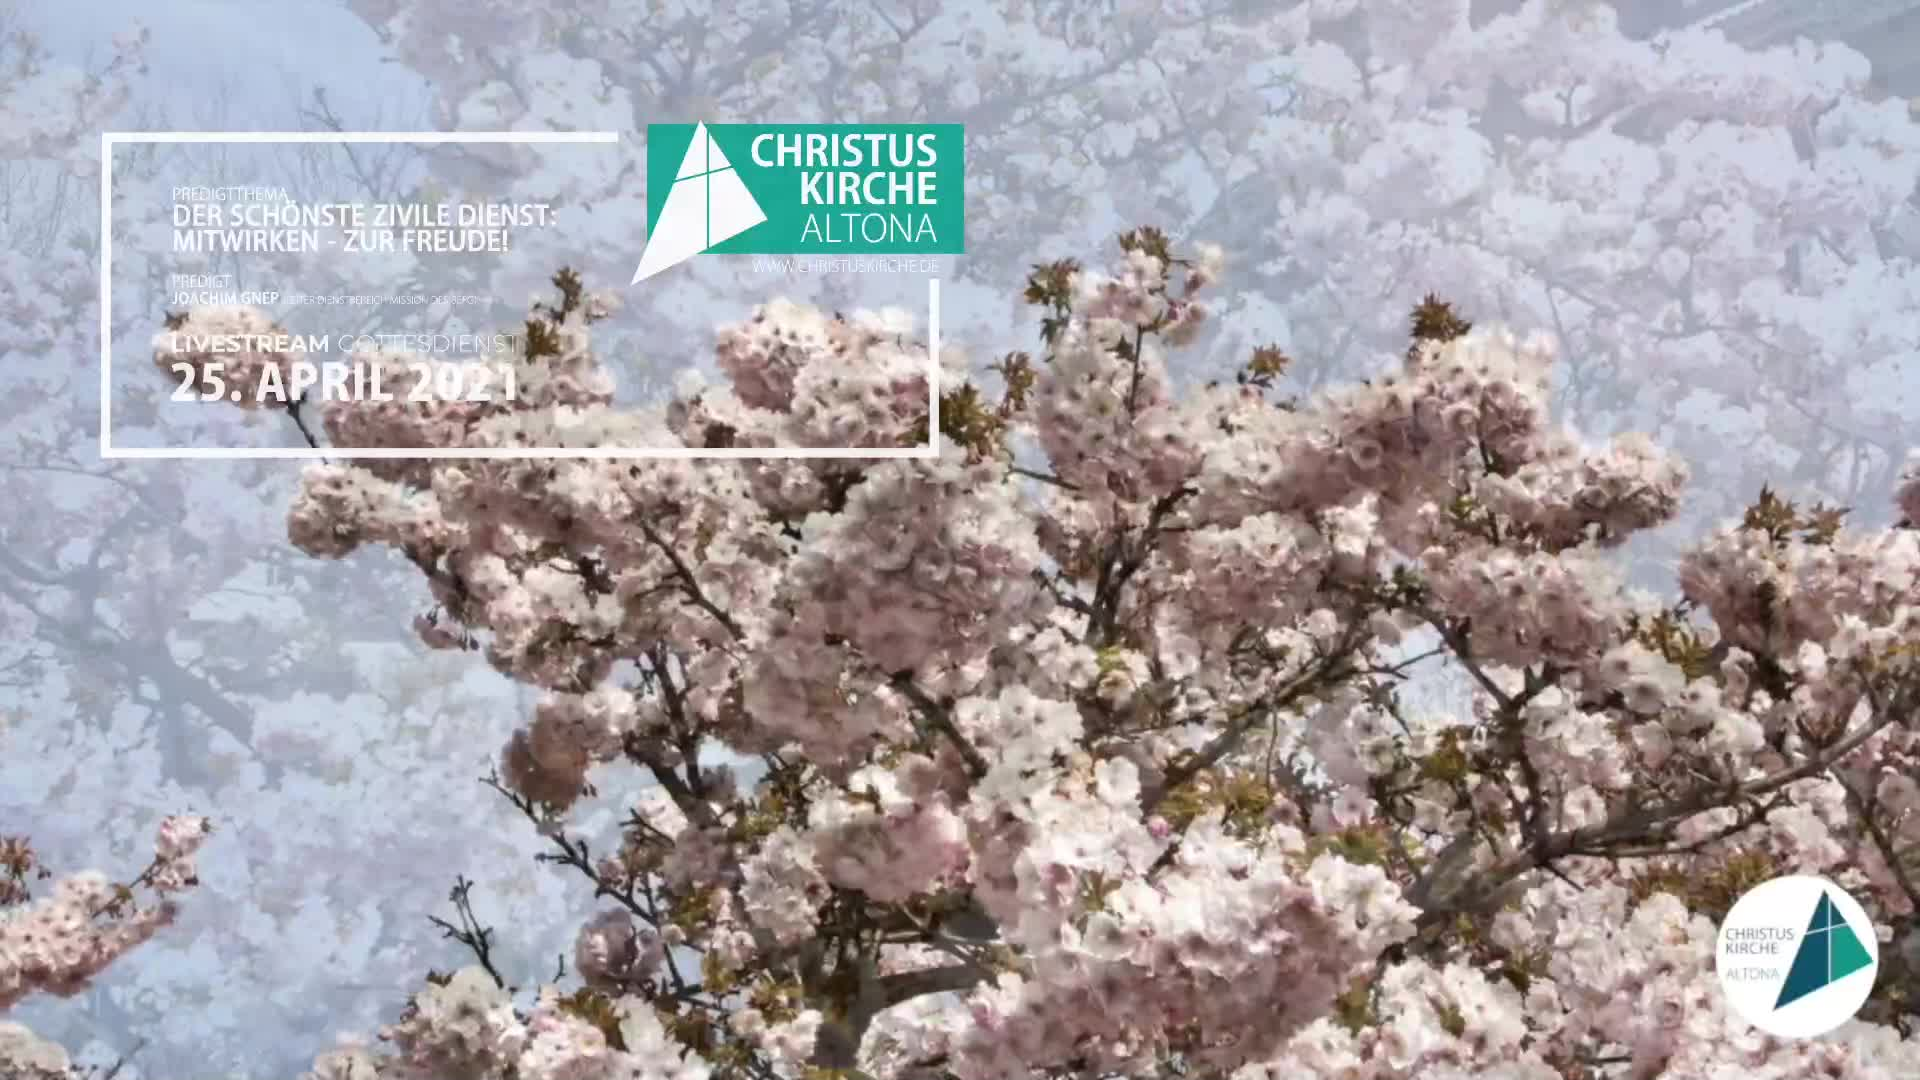 Gottesdienst - am 25. April - Livestream aus der Christuskirche Altona